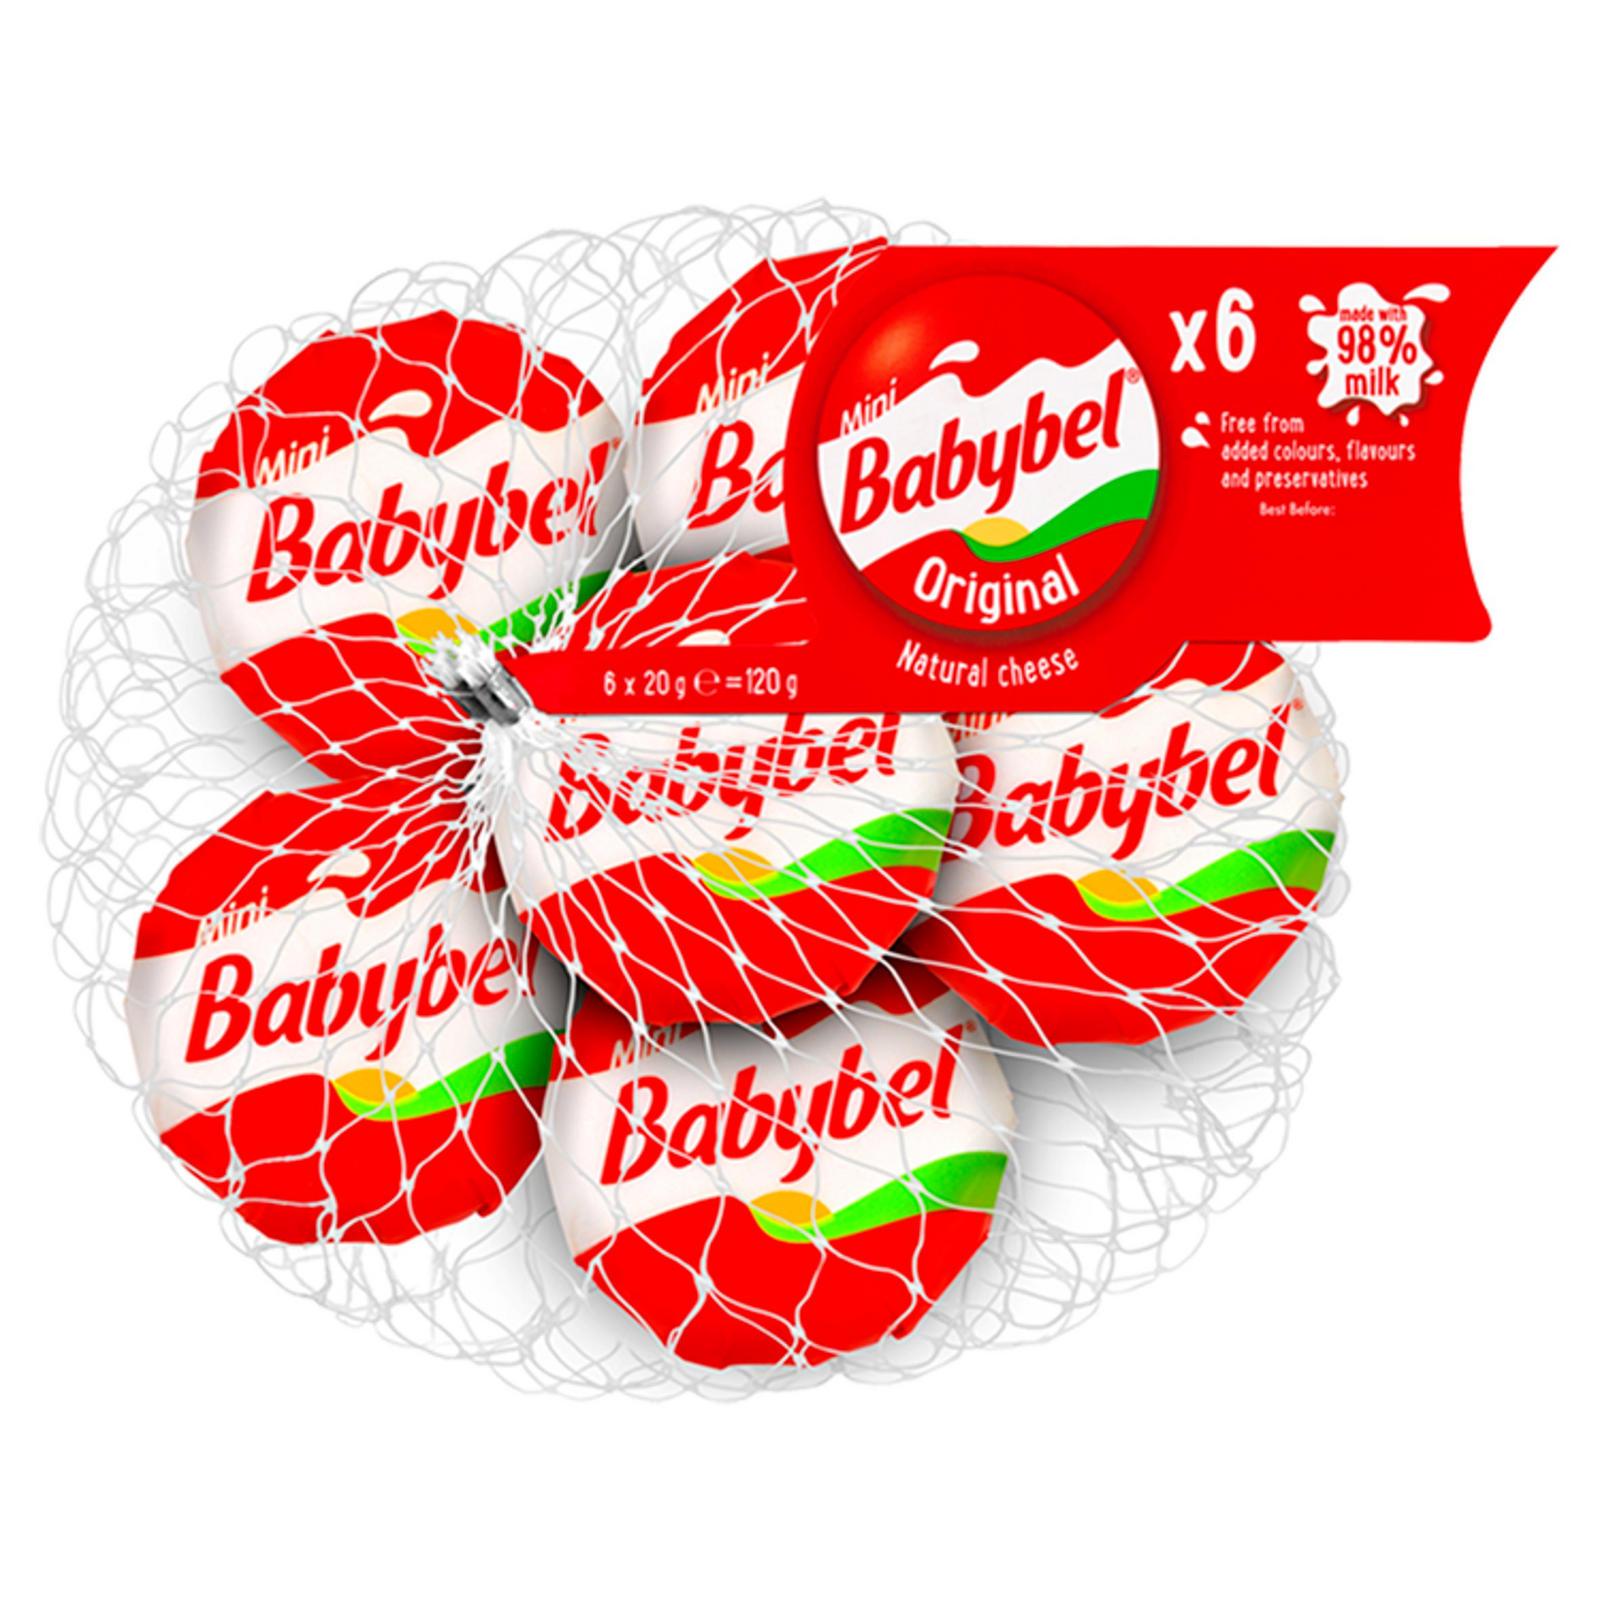 Mini Babybel 6-Pack Now £1 @ Iceland